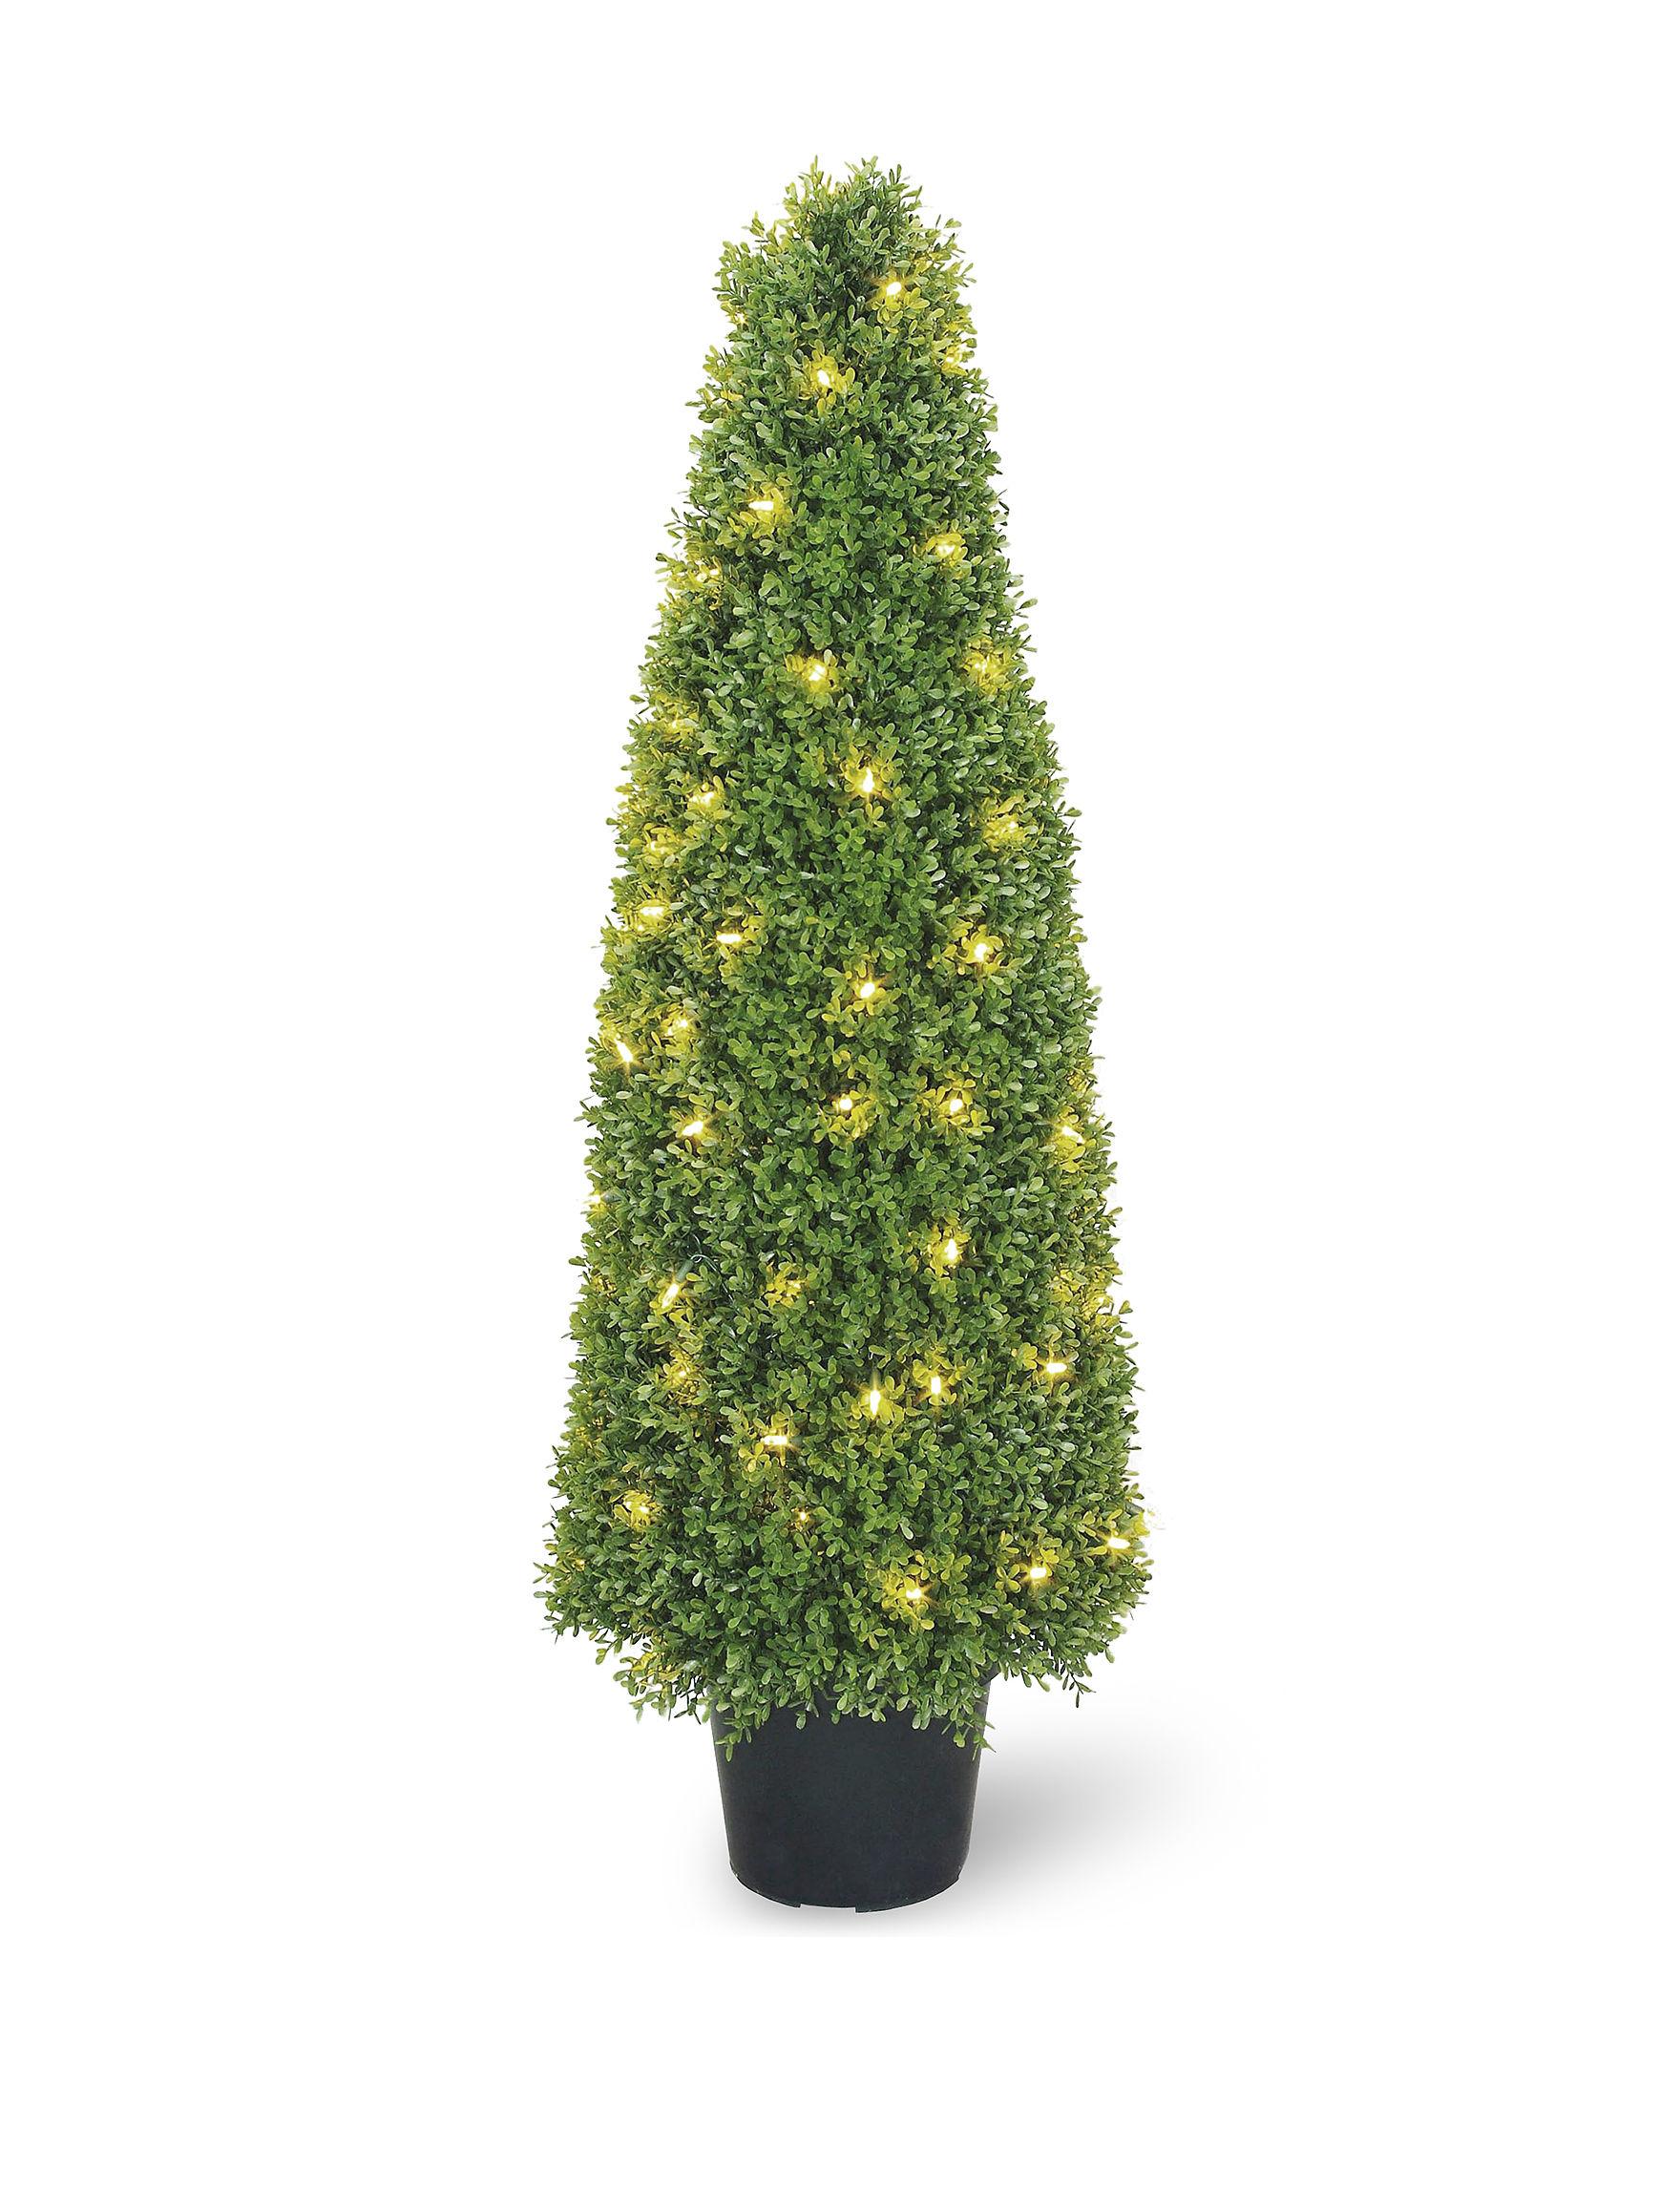 Outdoor Decor Company National Tree Company 48 Inch Pre Lit Boxwood Tree With Pot